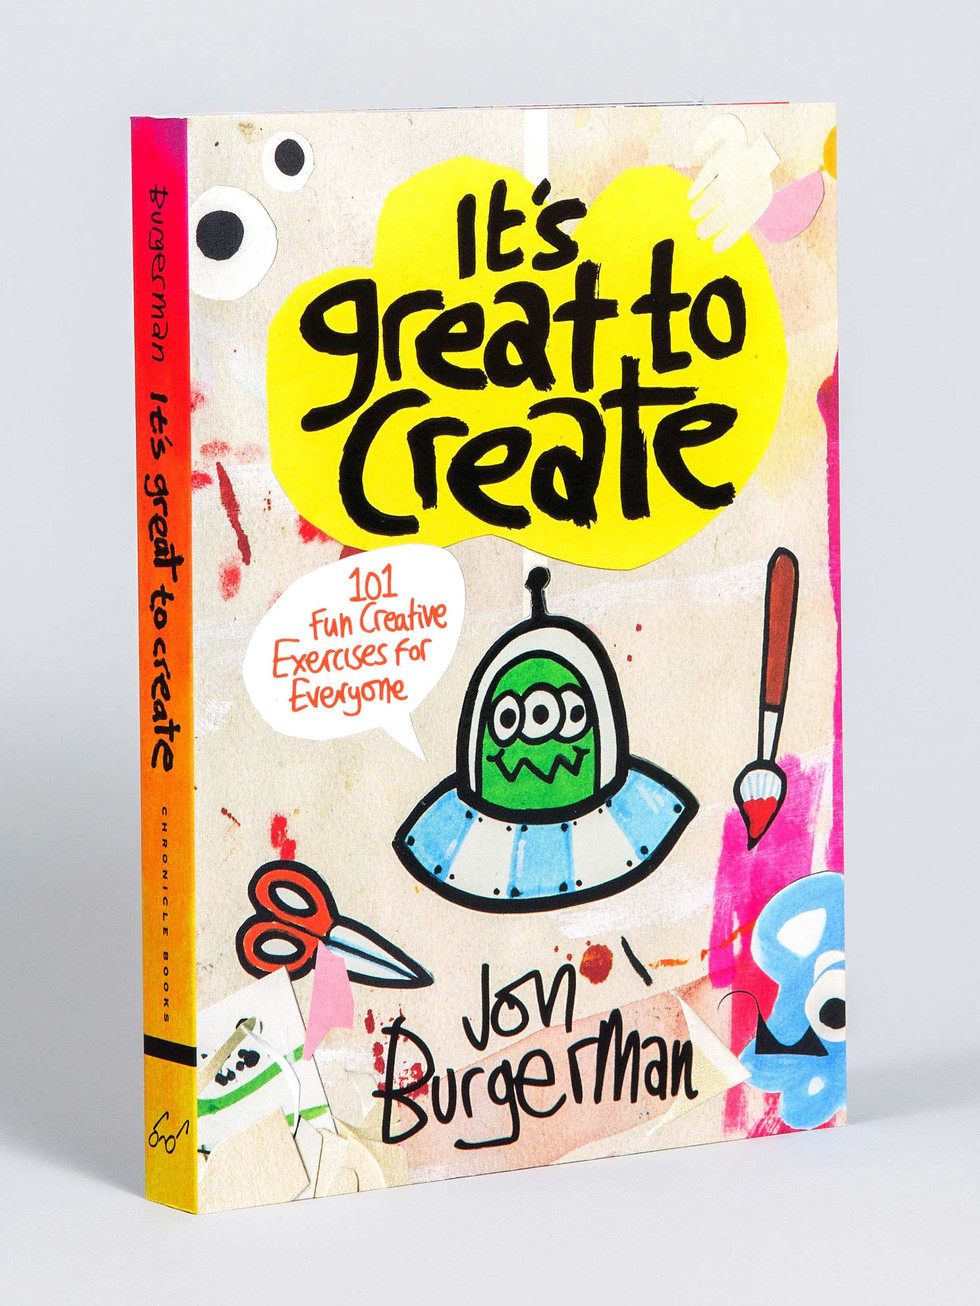 its-great-to-create-jon-burgerman02j